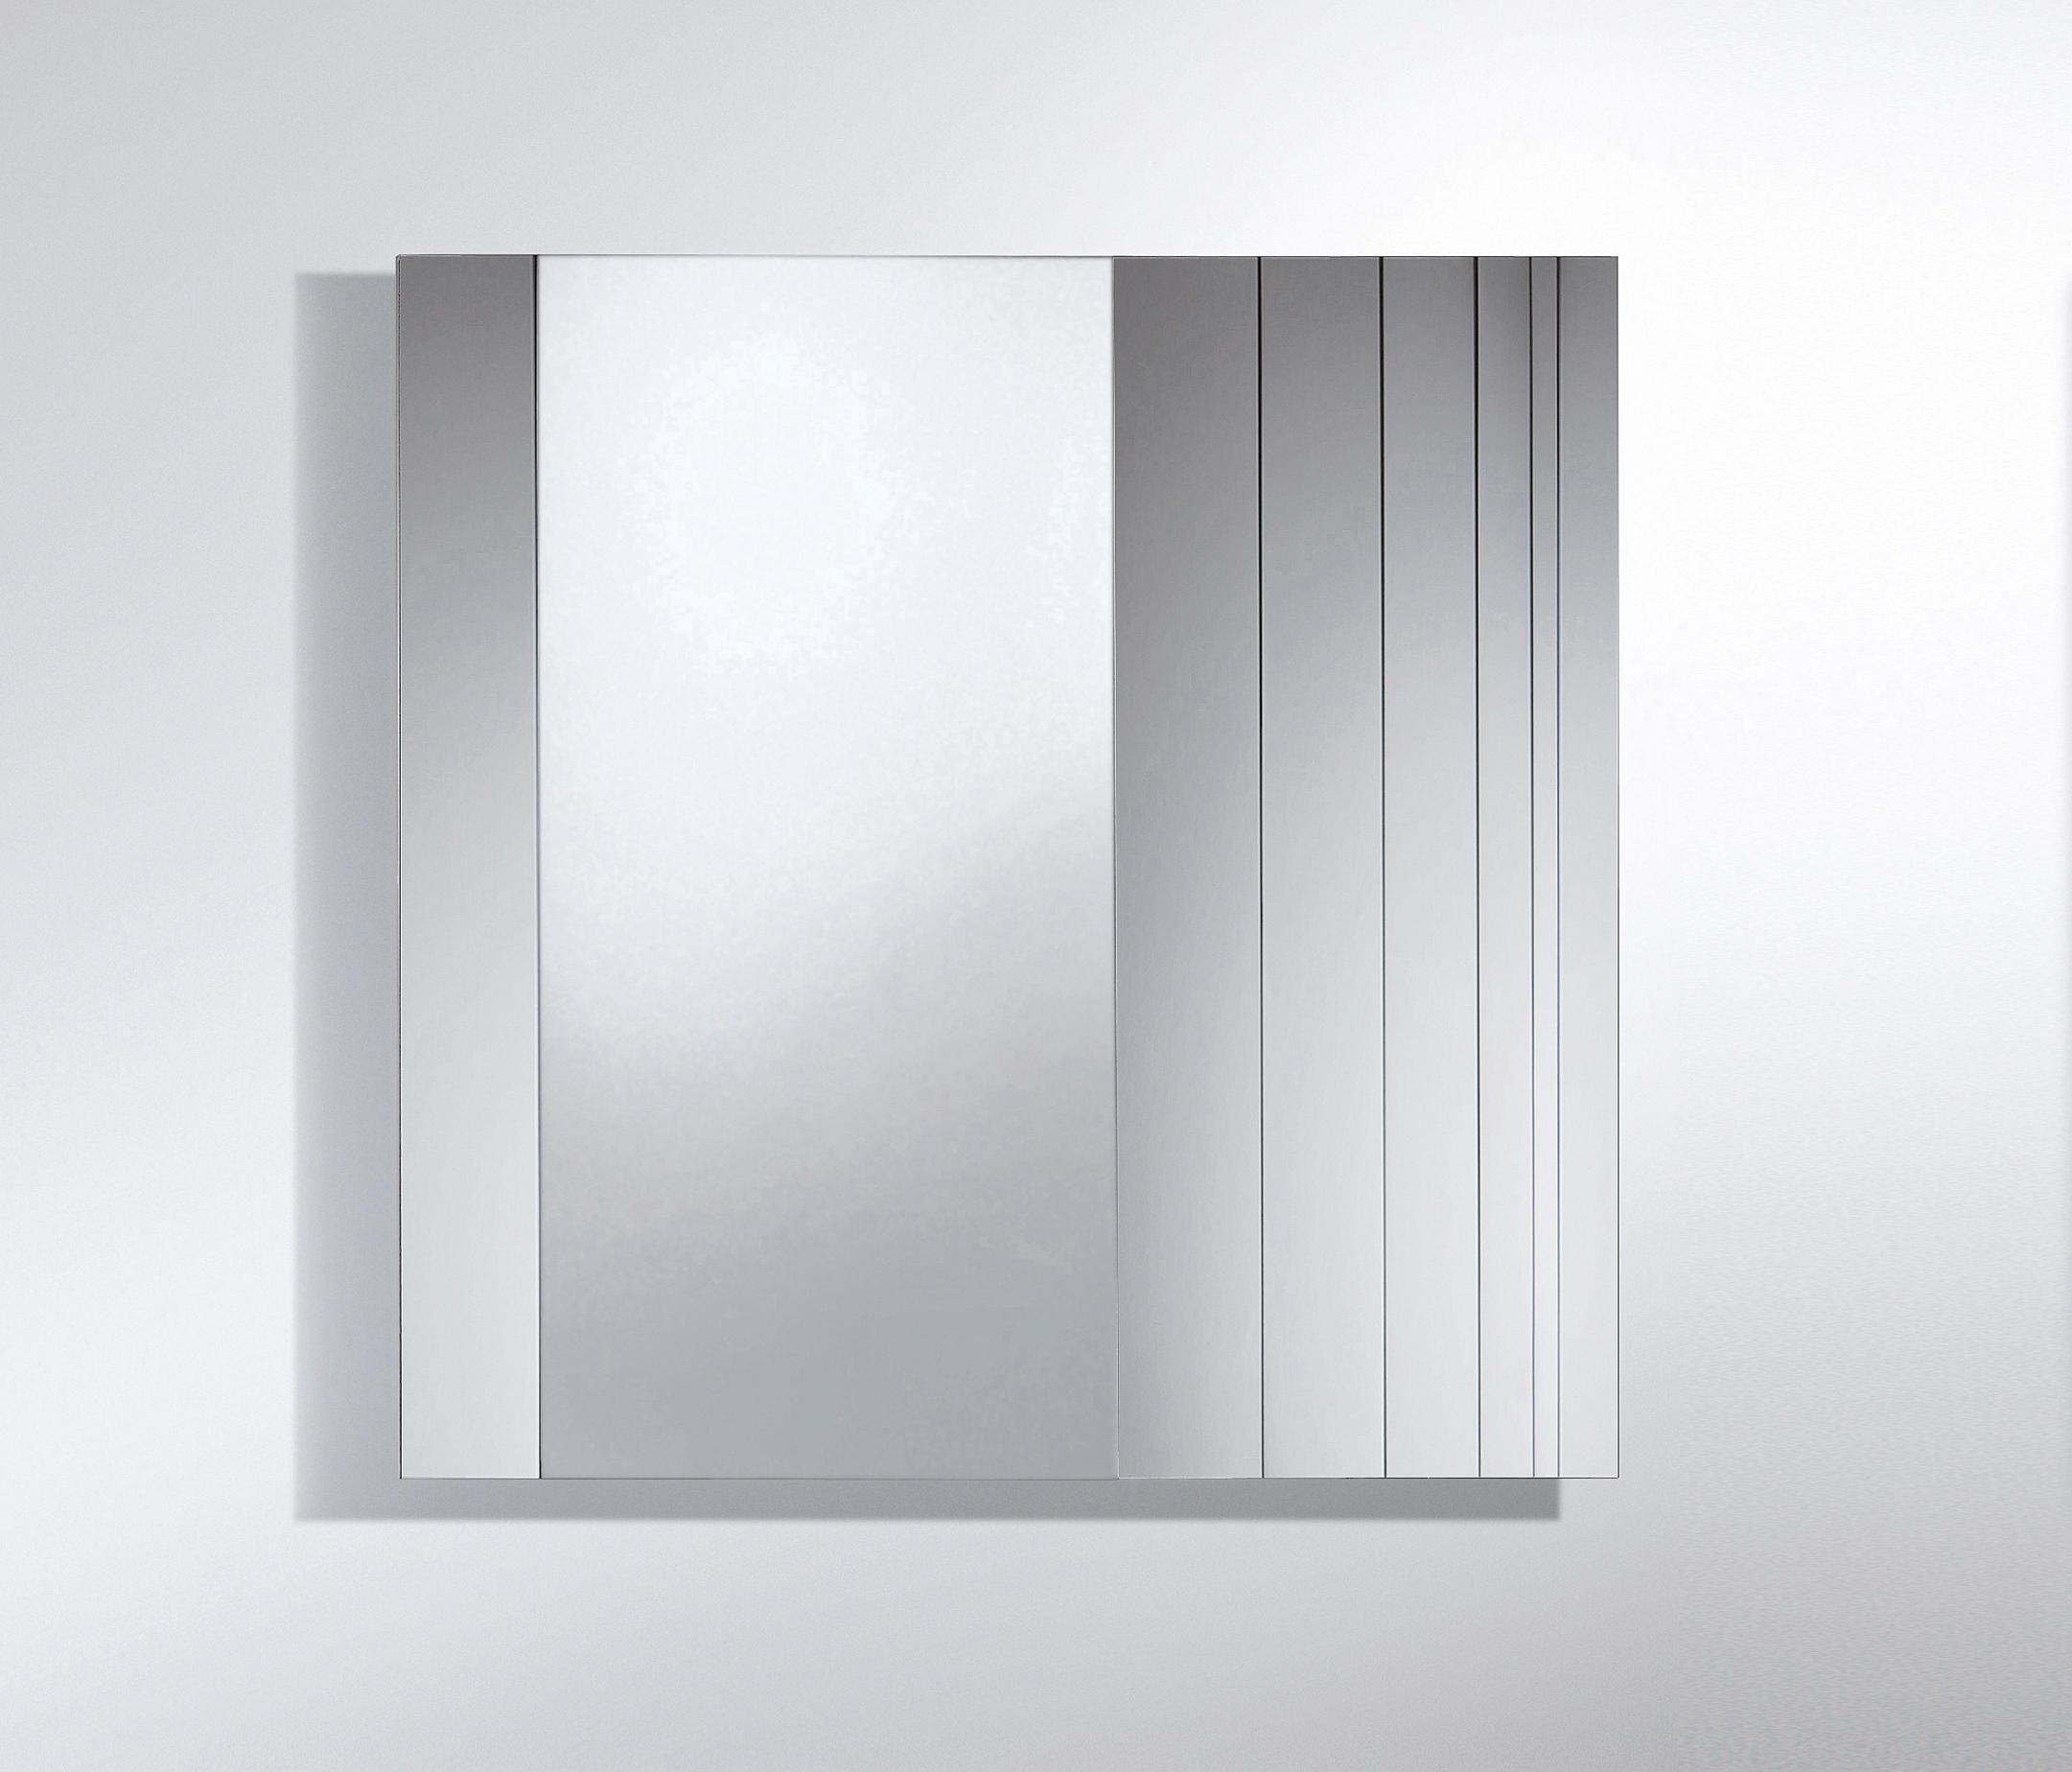 stars miroir miroirs de laurameroni architonic. Black Bedroom Furniture Sets. Home Design Ideas